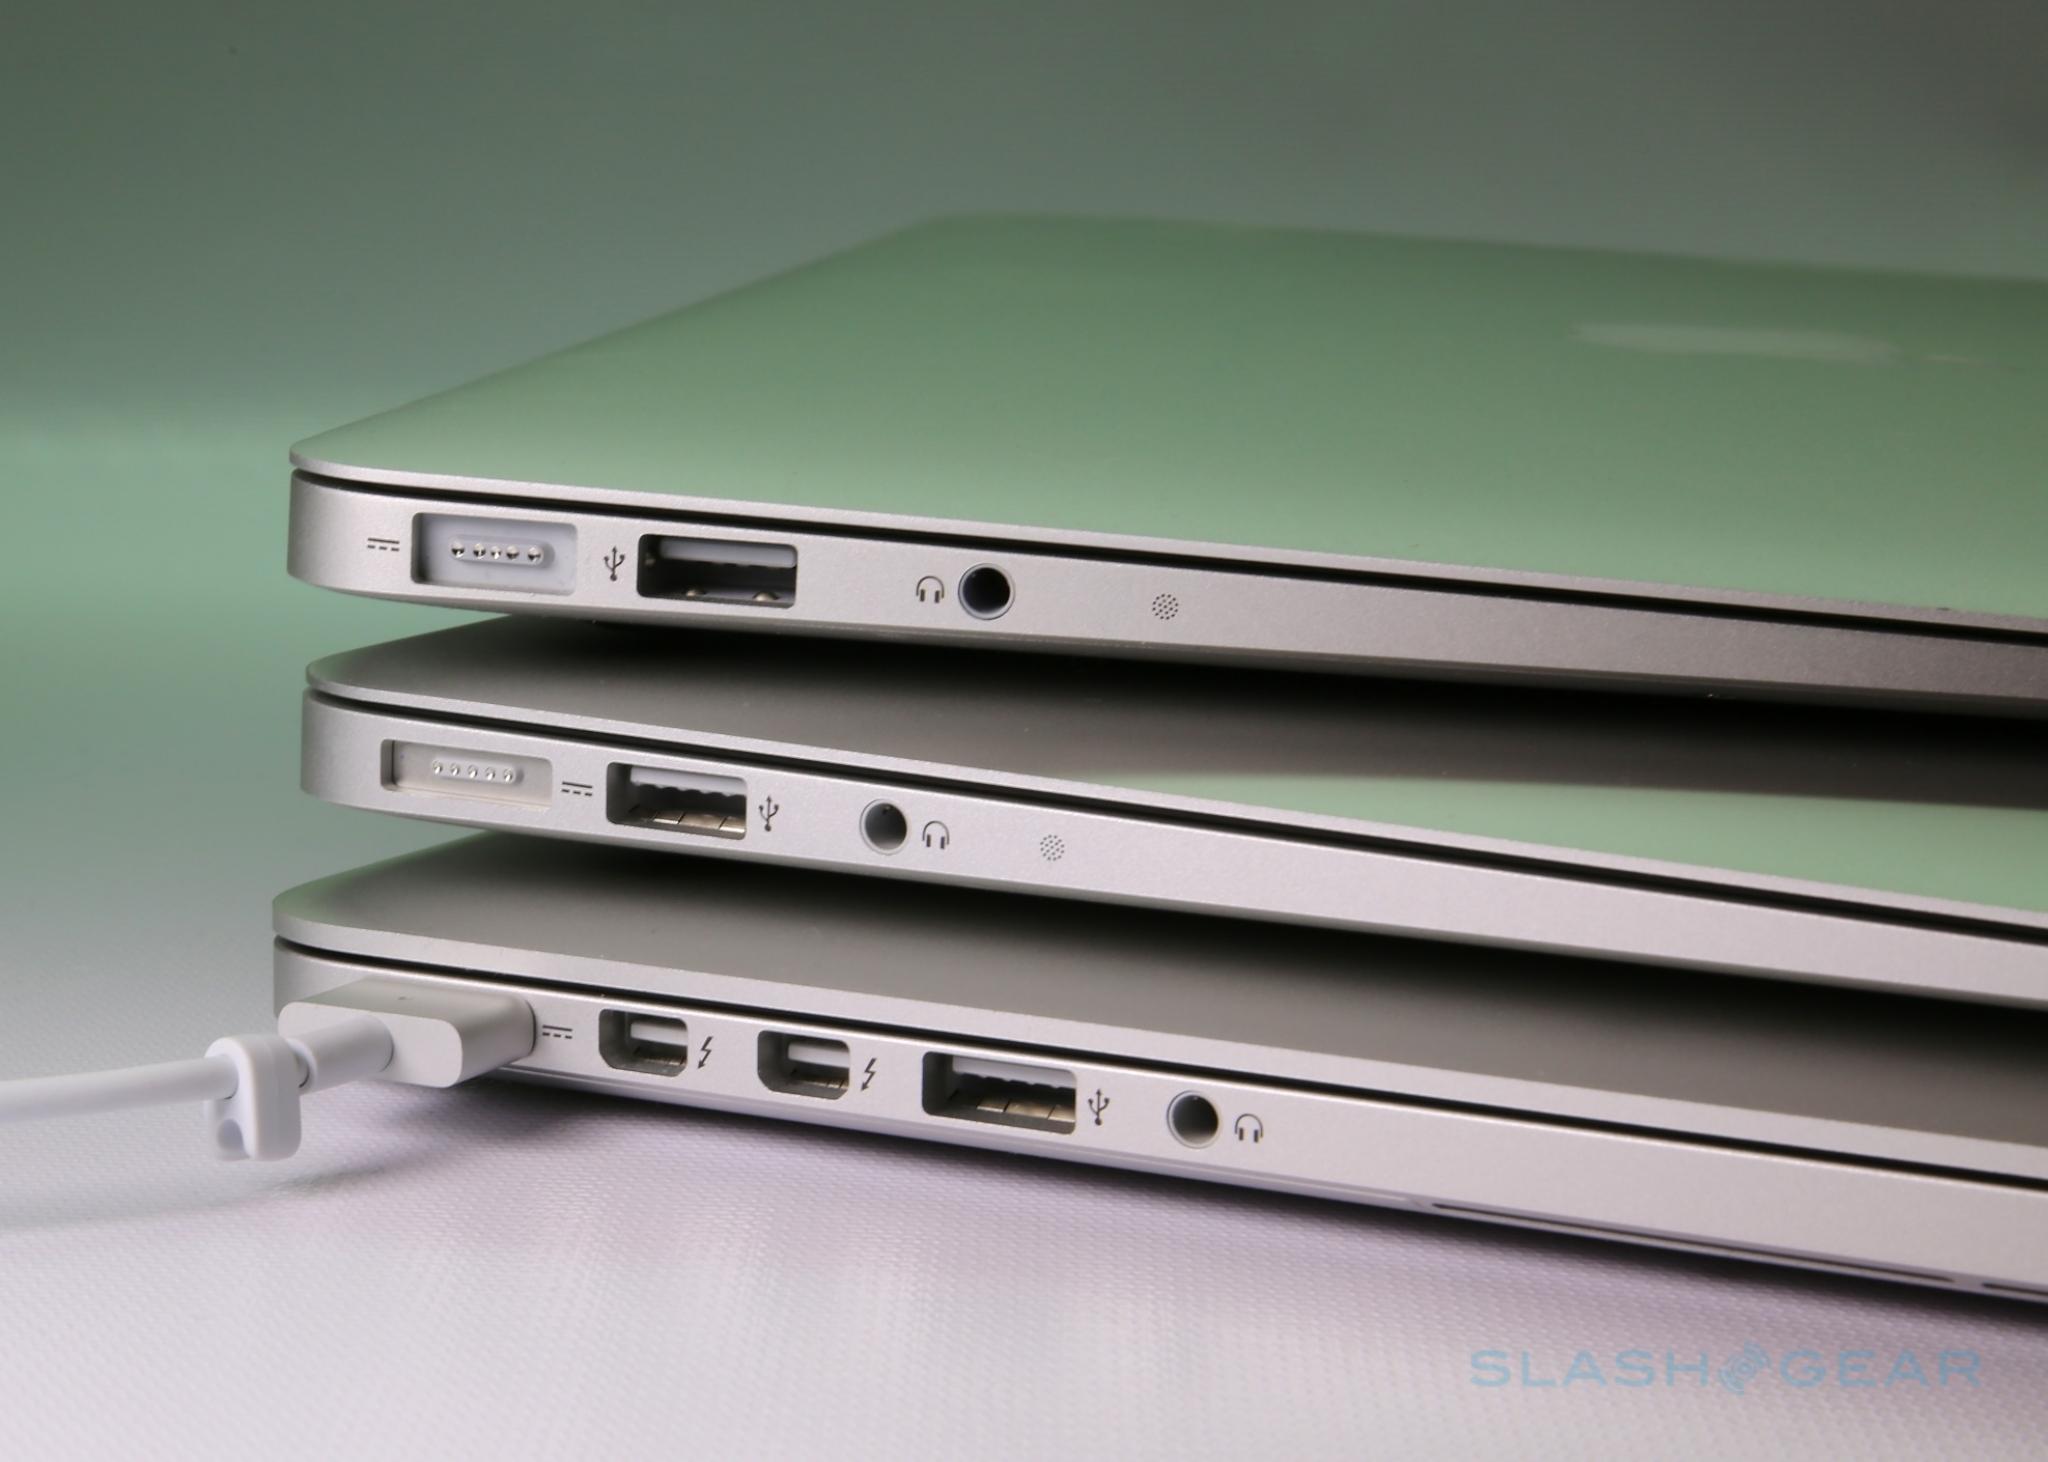 MacBook Air 13-inch Review (mid-2012) - SlashGear